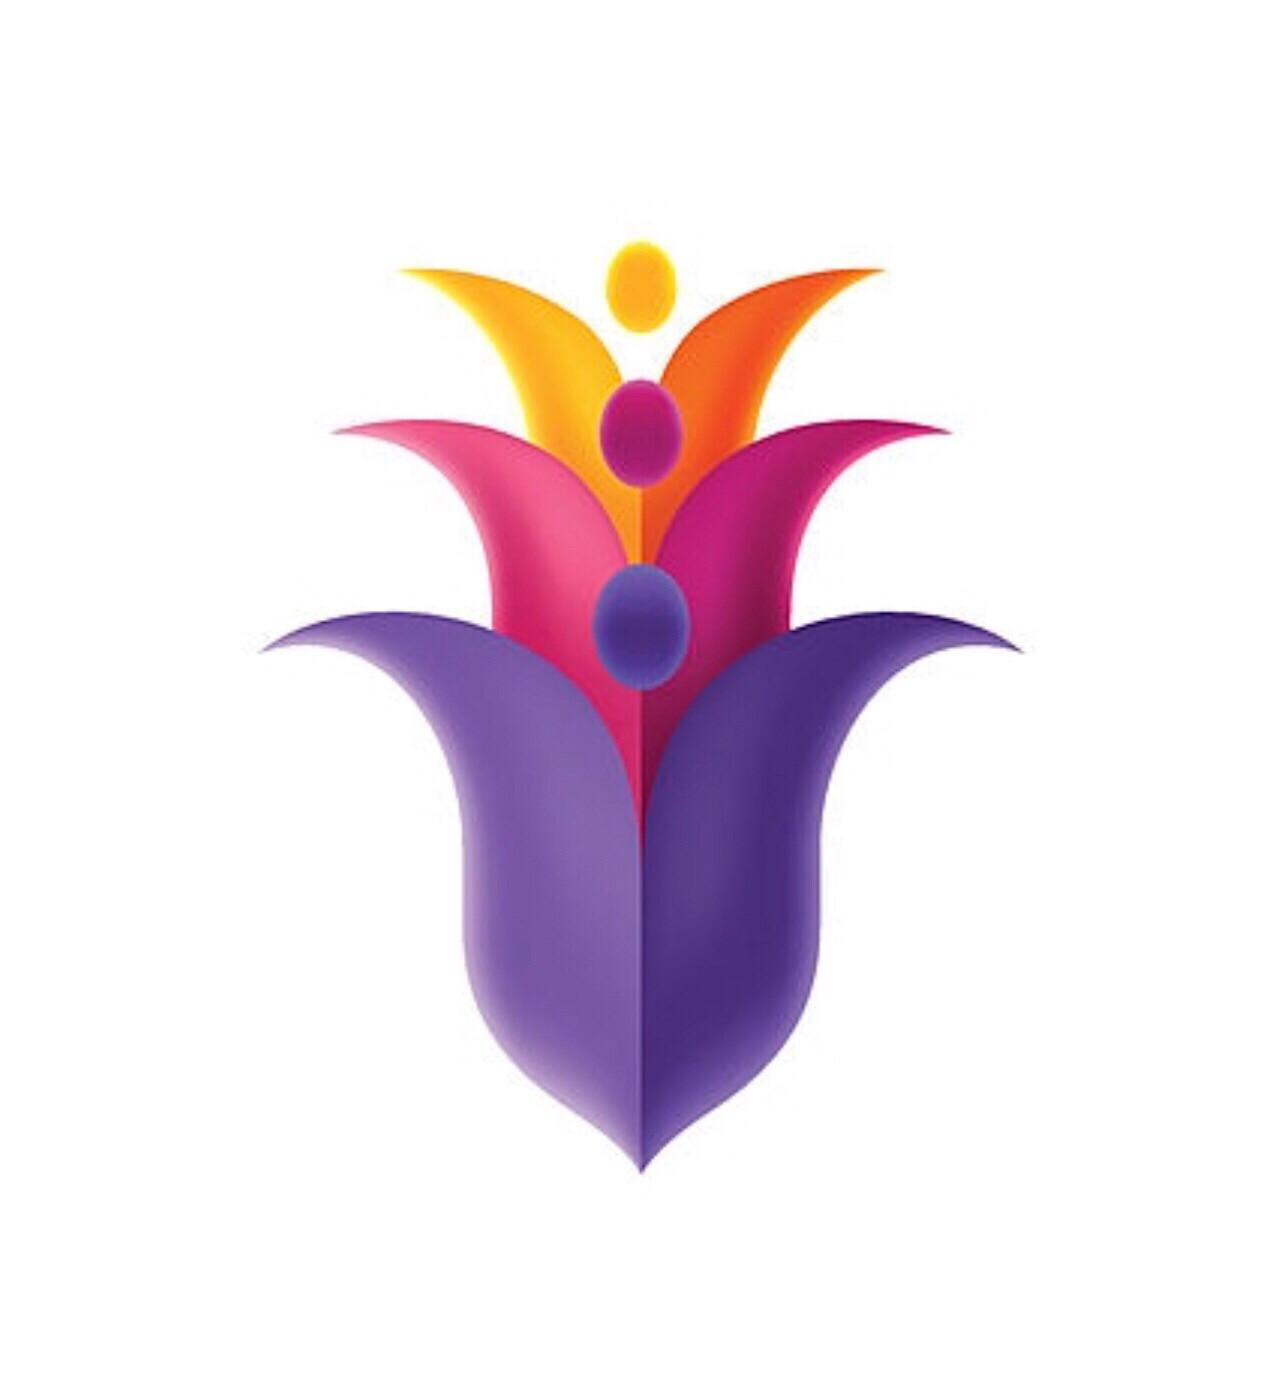 MALKHUT | Atendimento à Distância